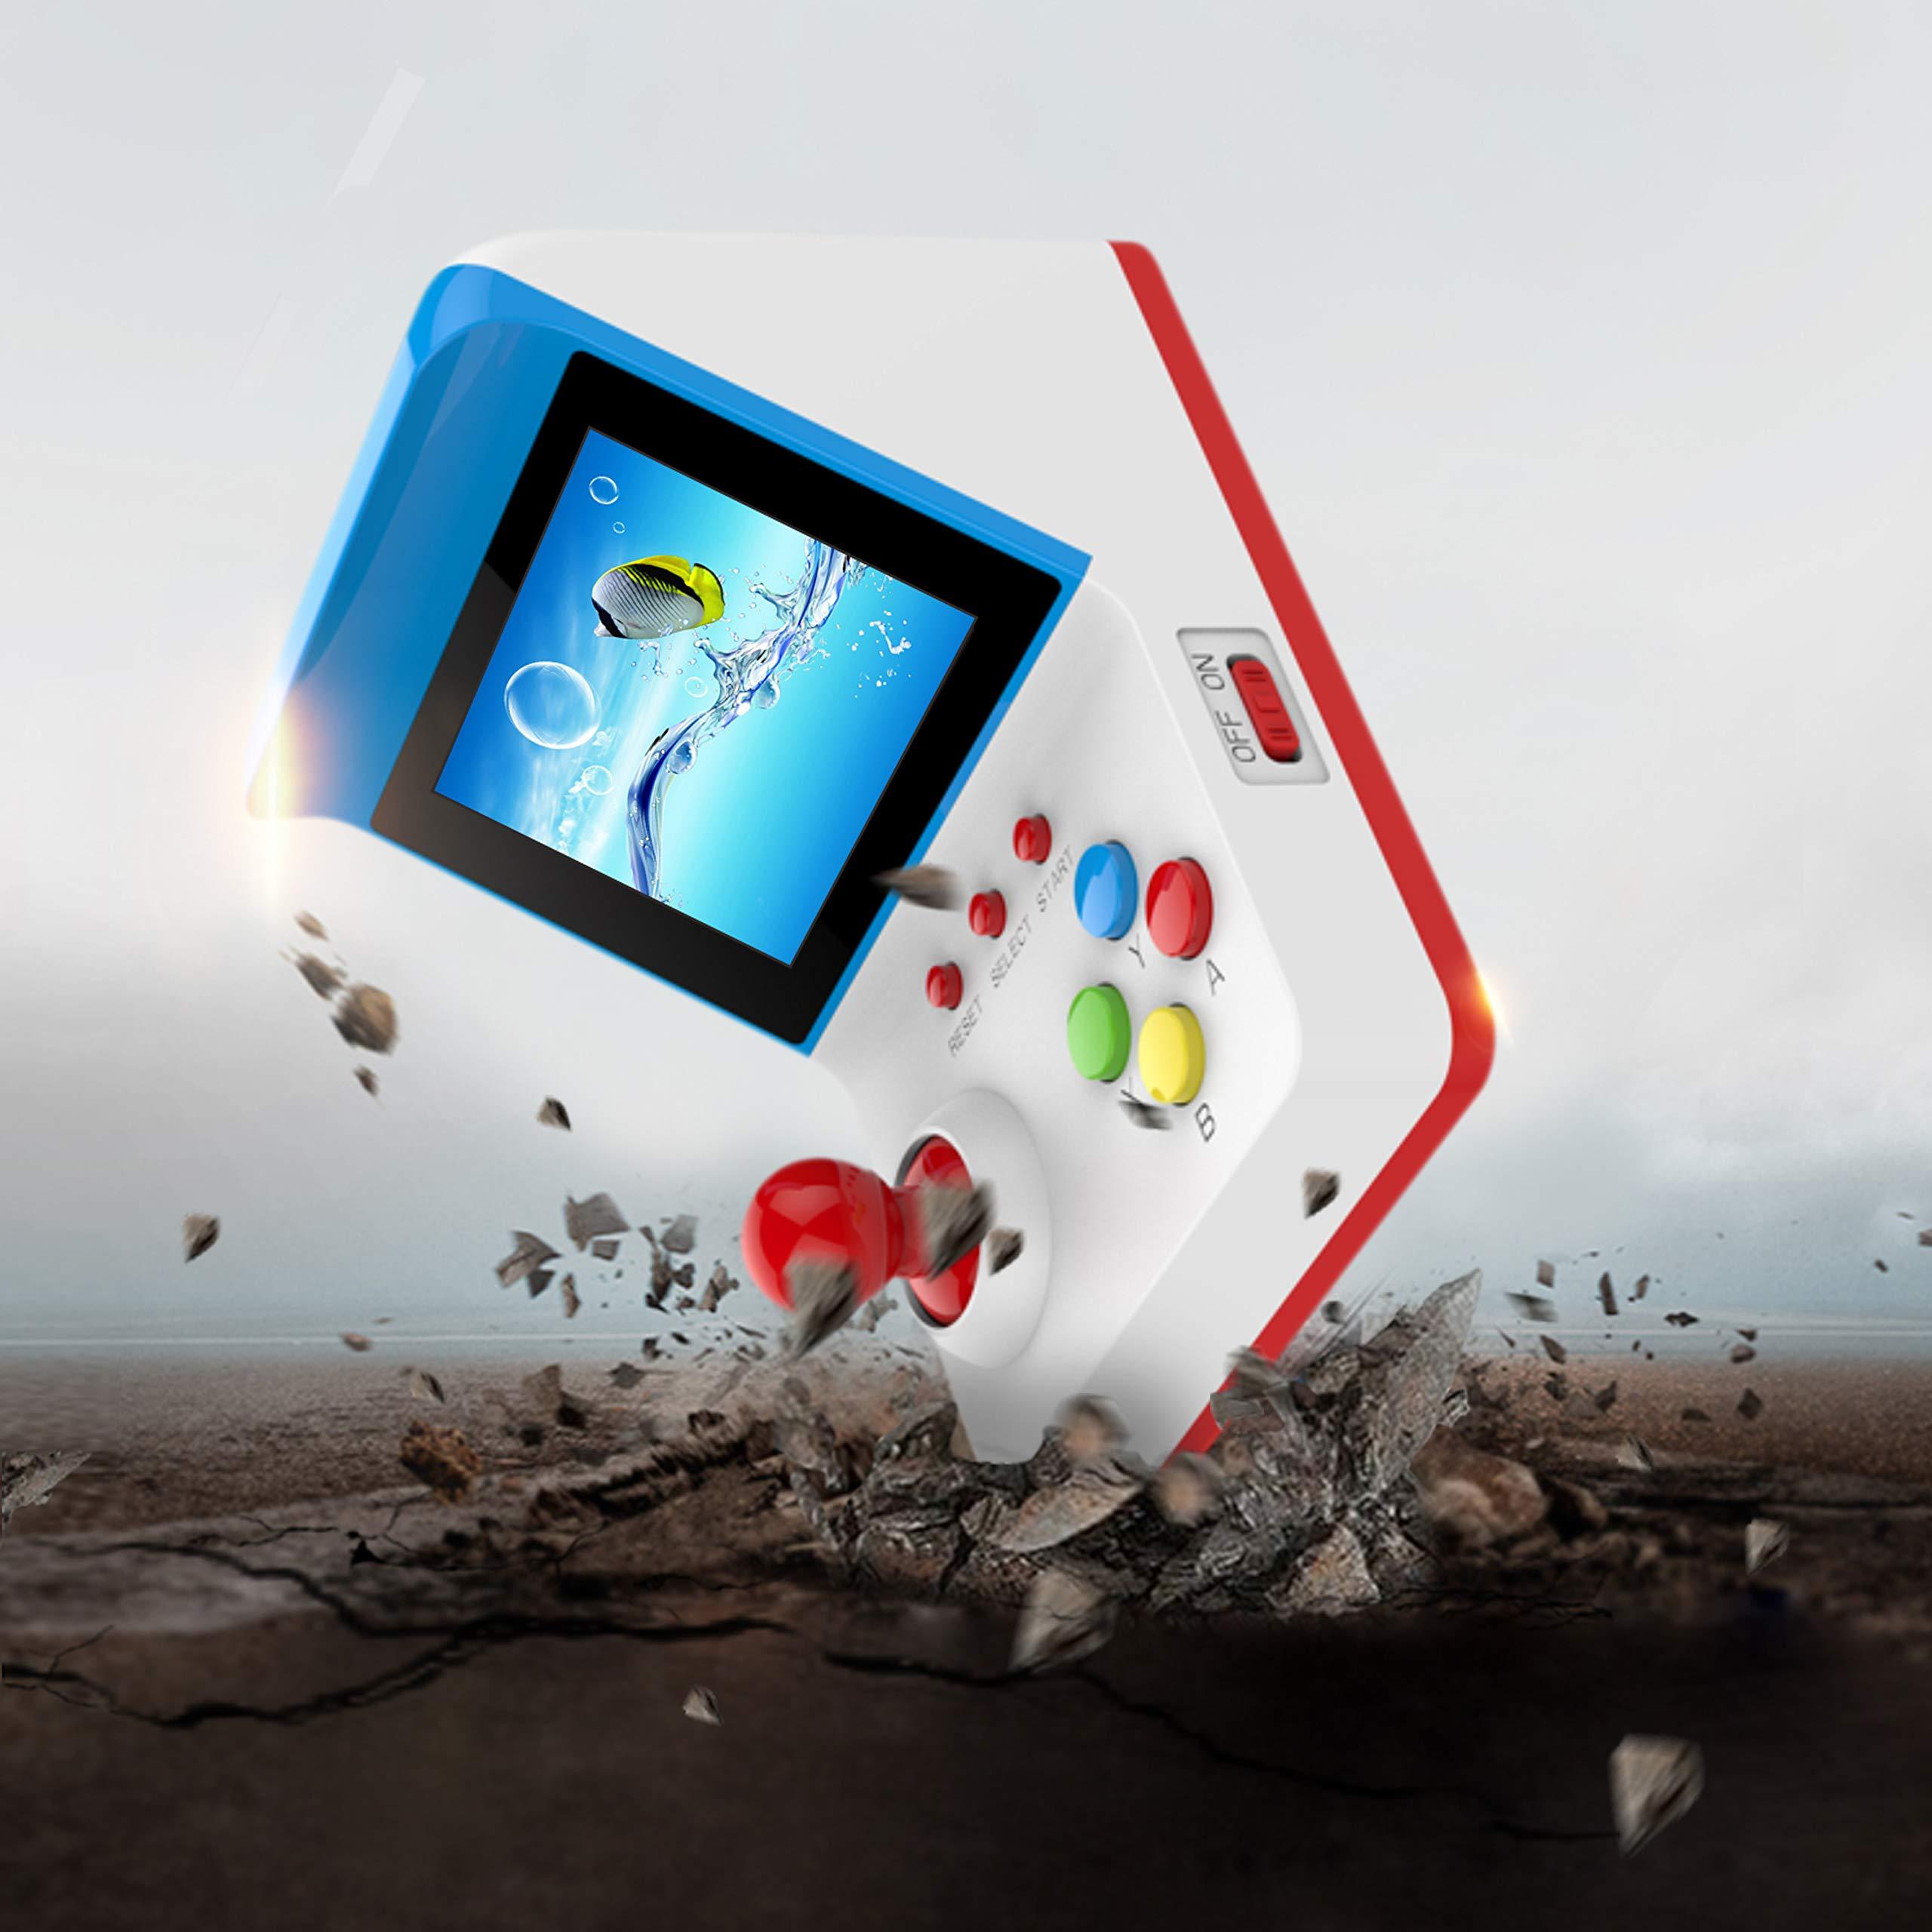 BAORUITENG Handheld Game Console, Retro FC Game Console Video Game Console with 3 Inch 360 Classic Games with 2 Joysticks , Birthday Present for Children (red) by BAORUITENG (Image #4)